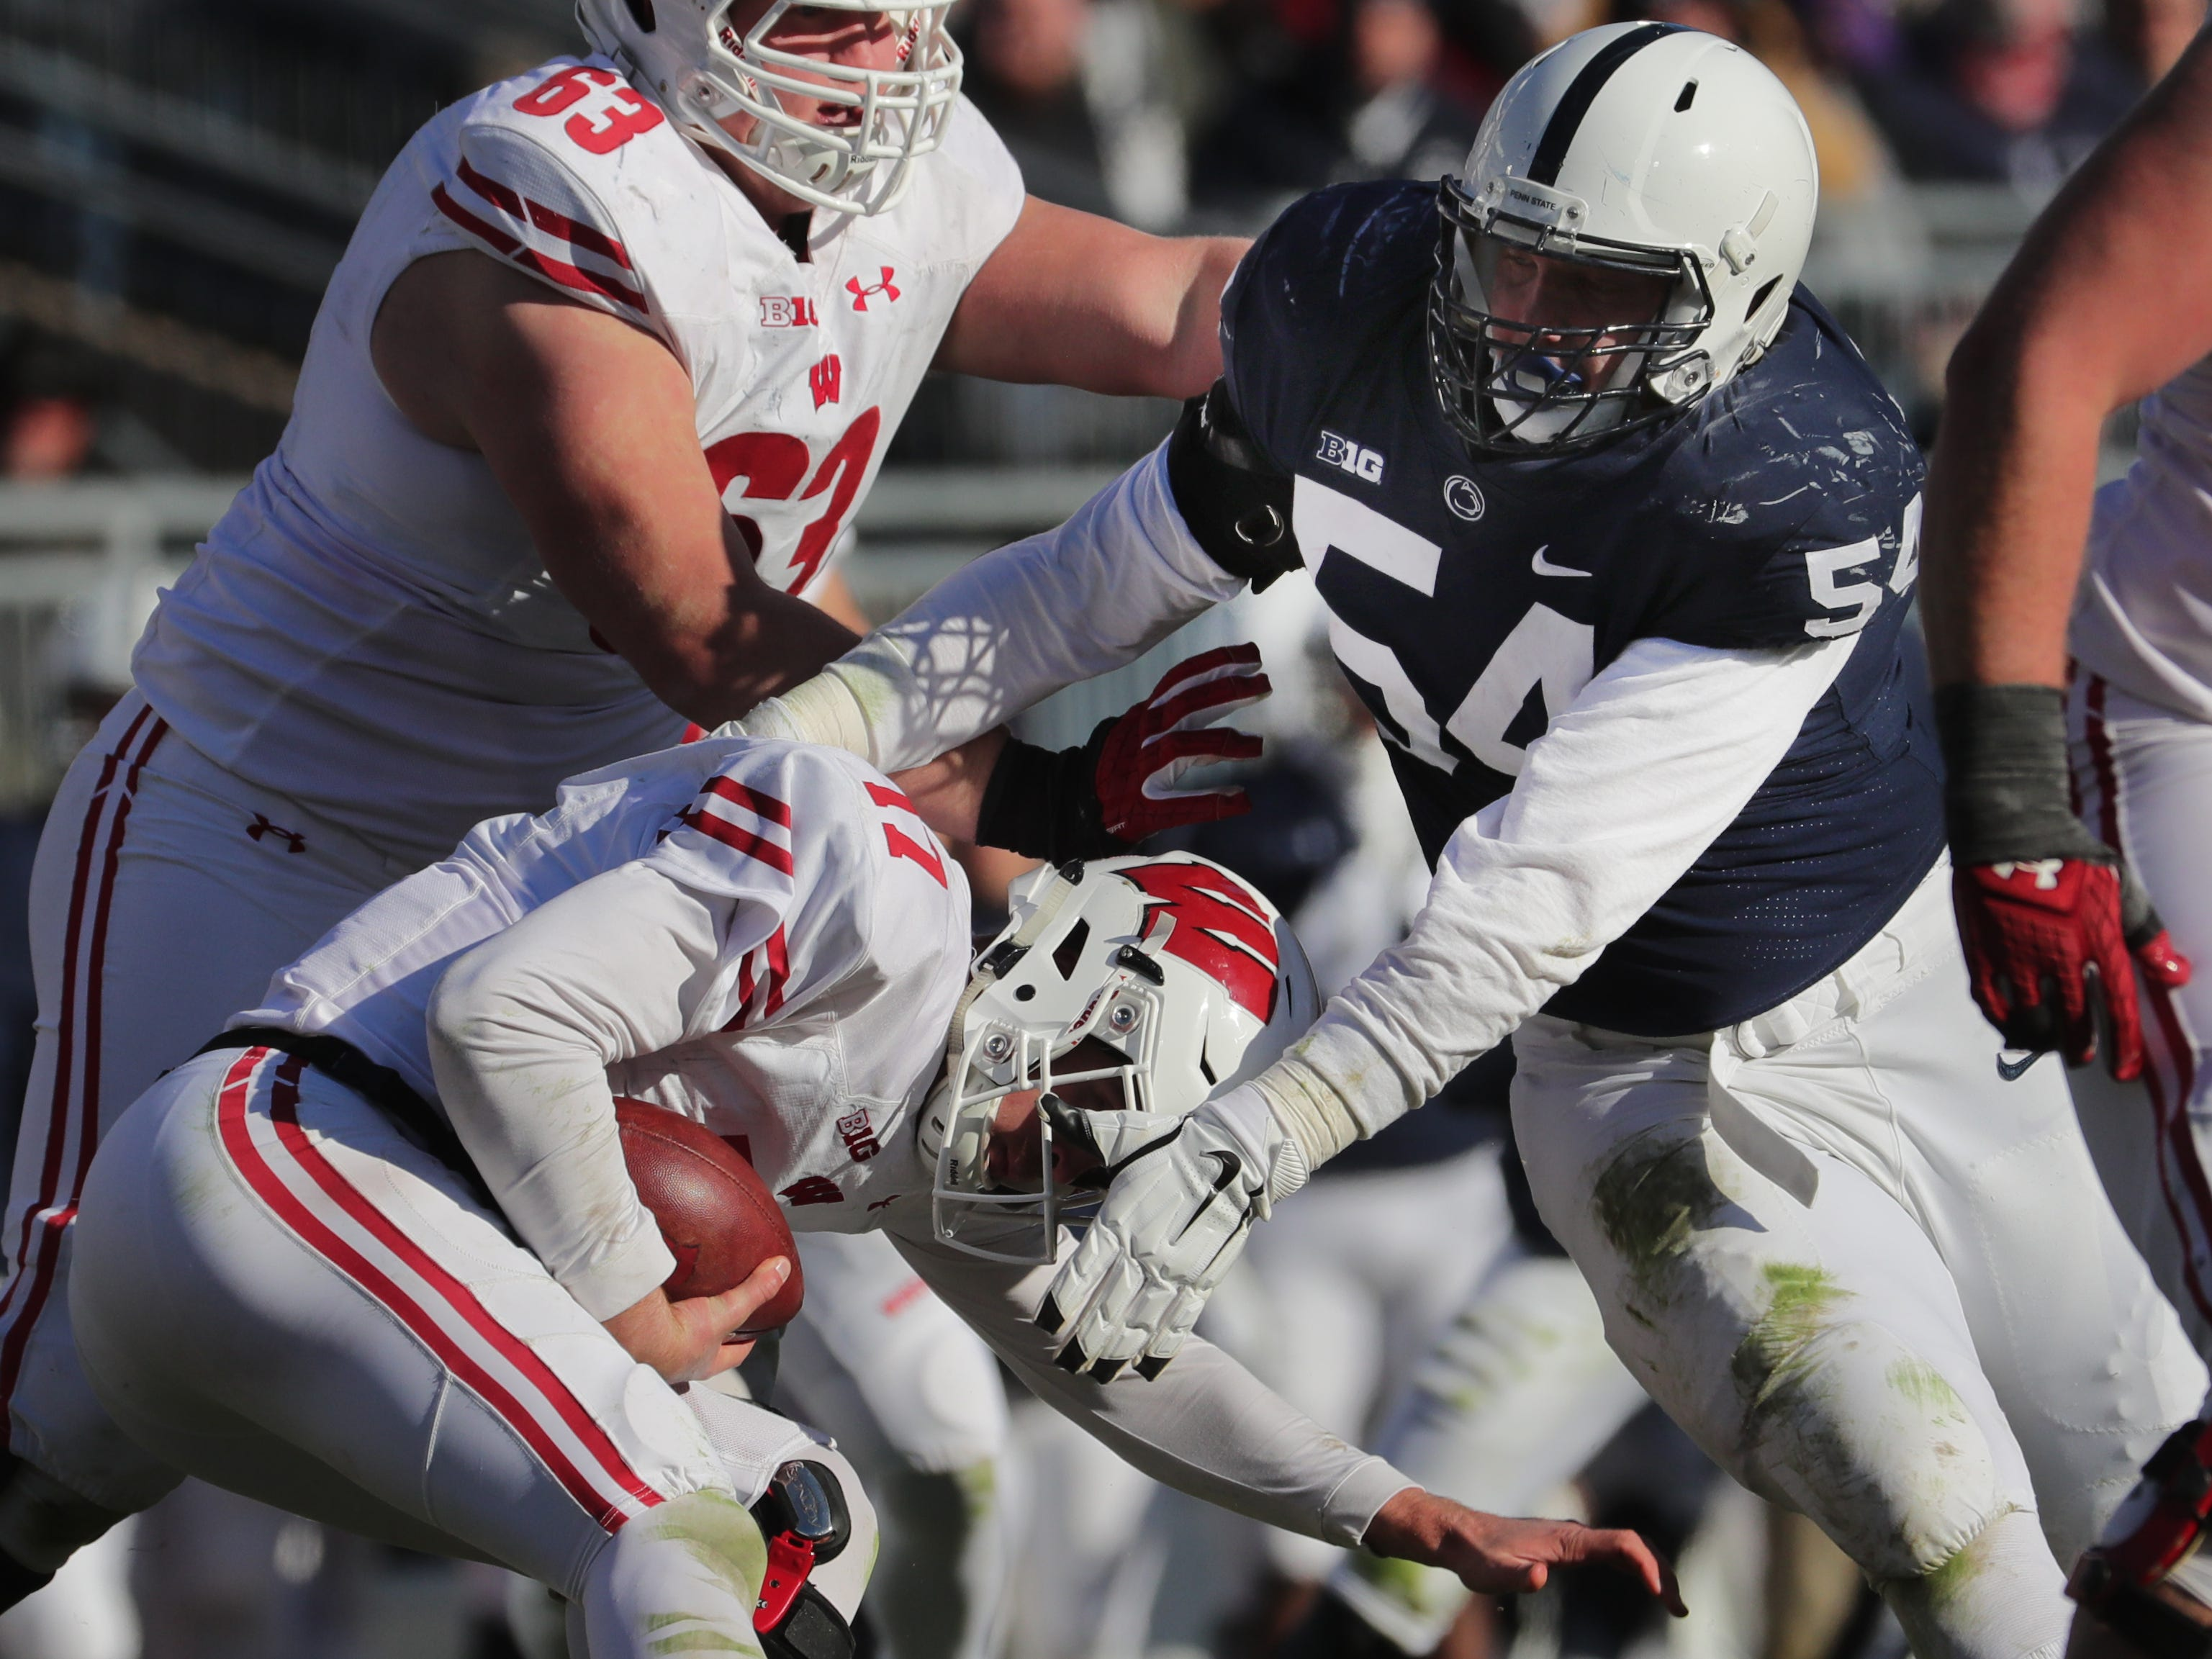 Penn State defensive tackle Robert Windsor sacks Wisconsin quarterback Jack Coan during the third quarter Saturday,